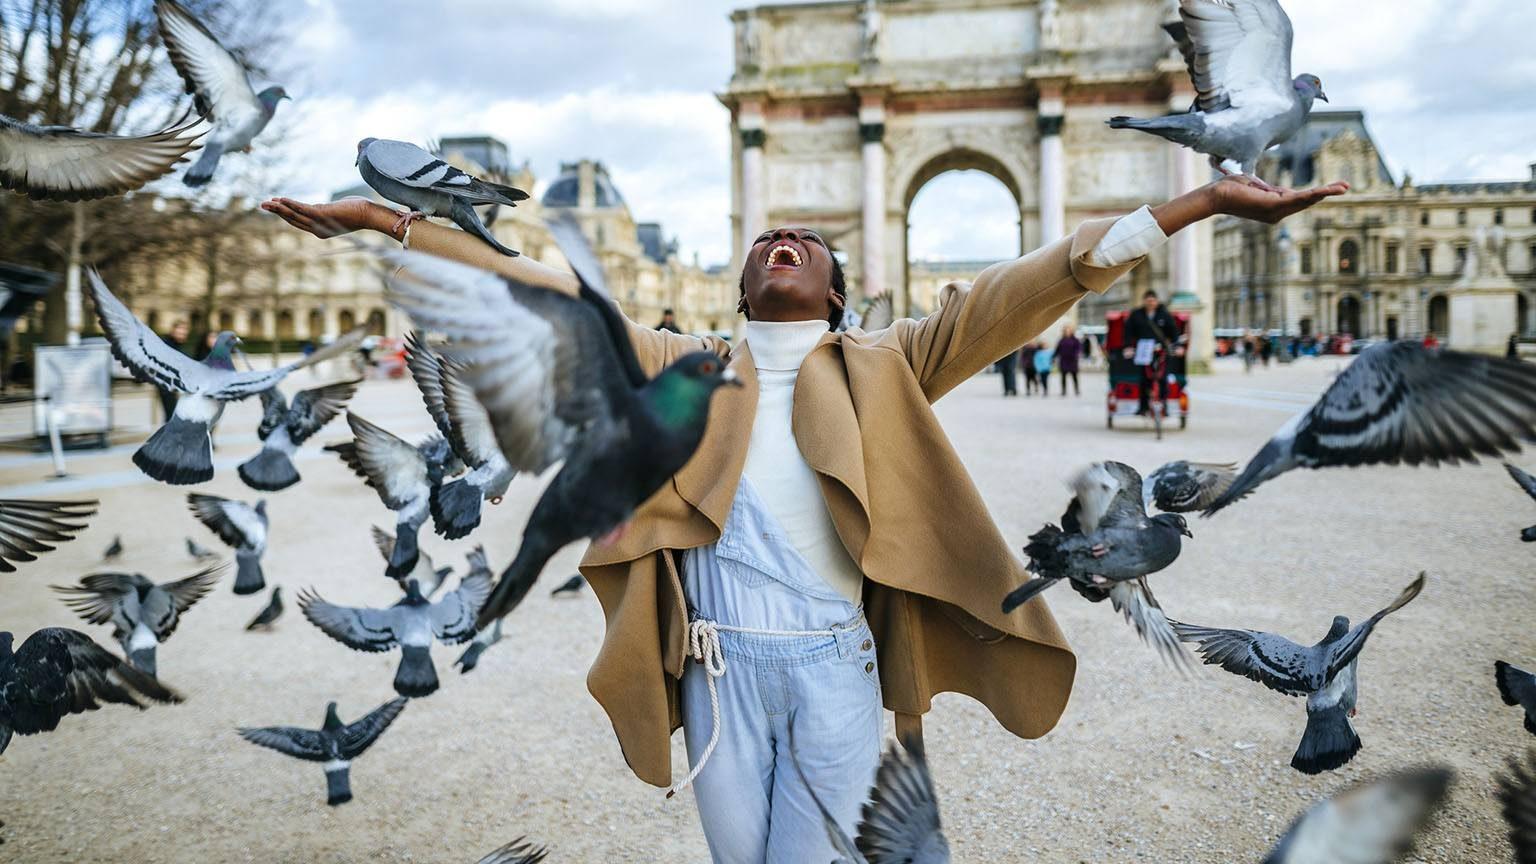 Happy woman with flying pidgeons